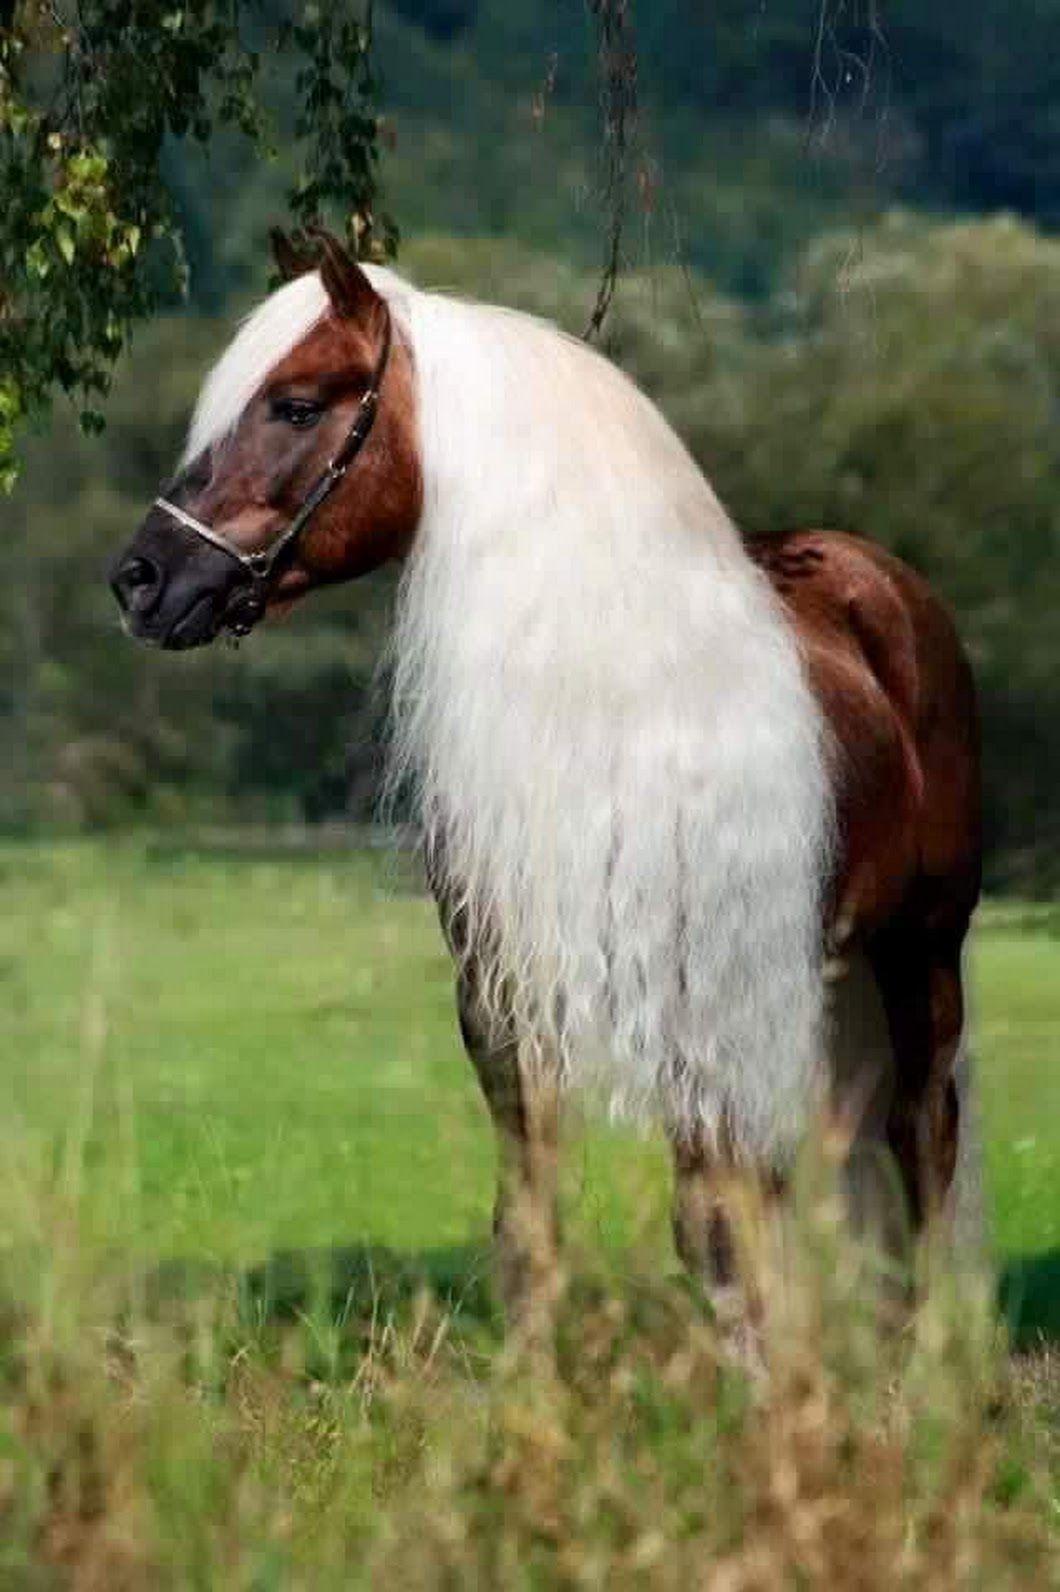 1d1f4f2857857 Pin de Pepe In Wonderland en Caballos   Pinterest   Horses ...